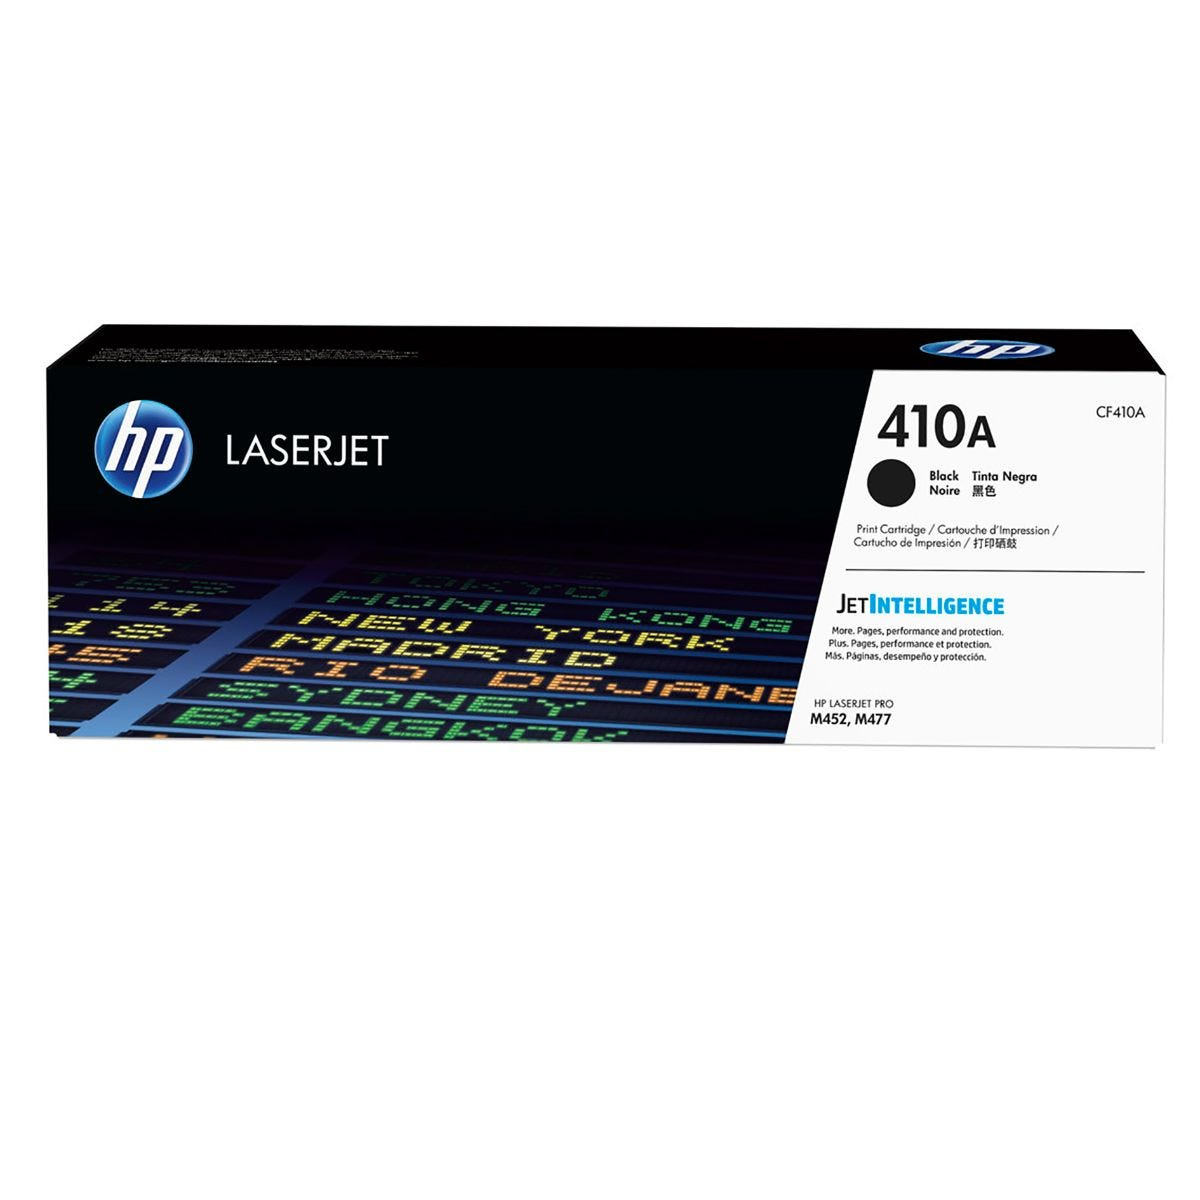 HP 410A Toner Cartridge Black CF410A, Black